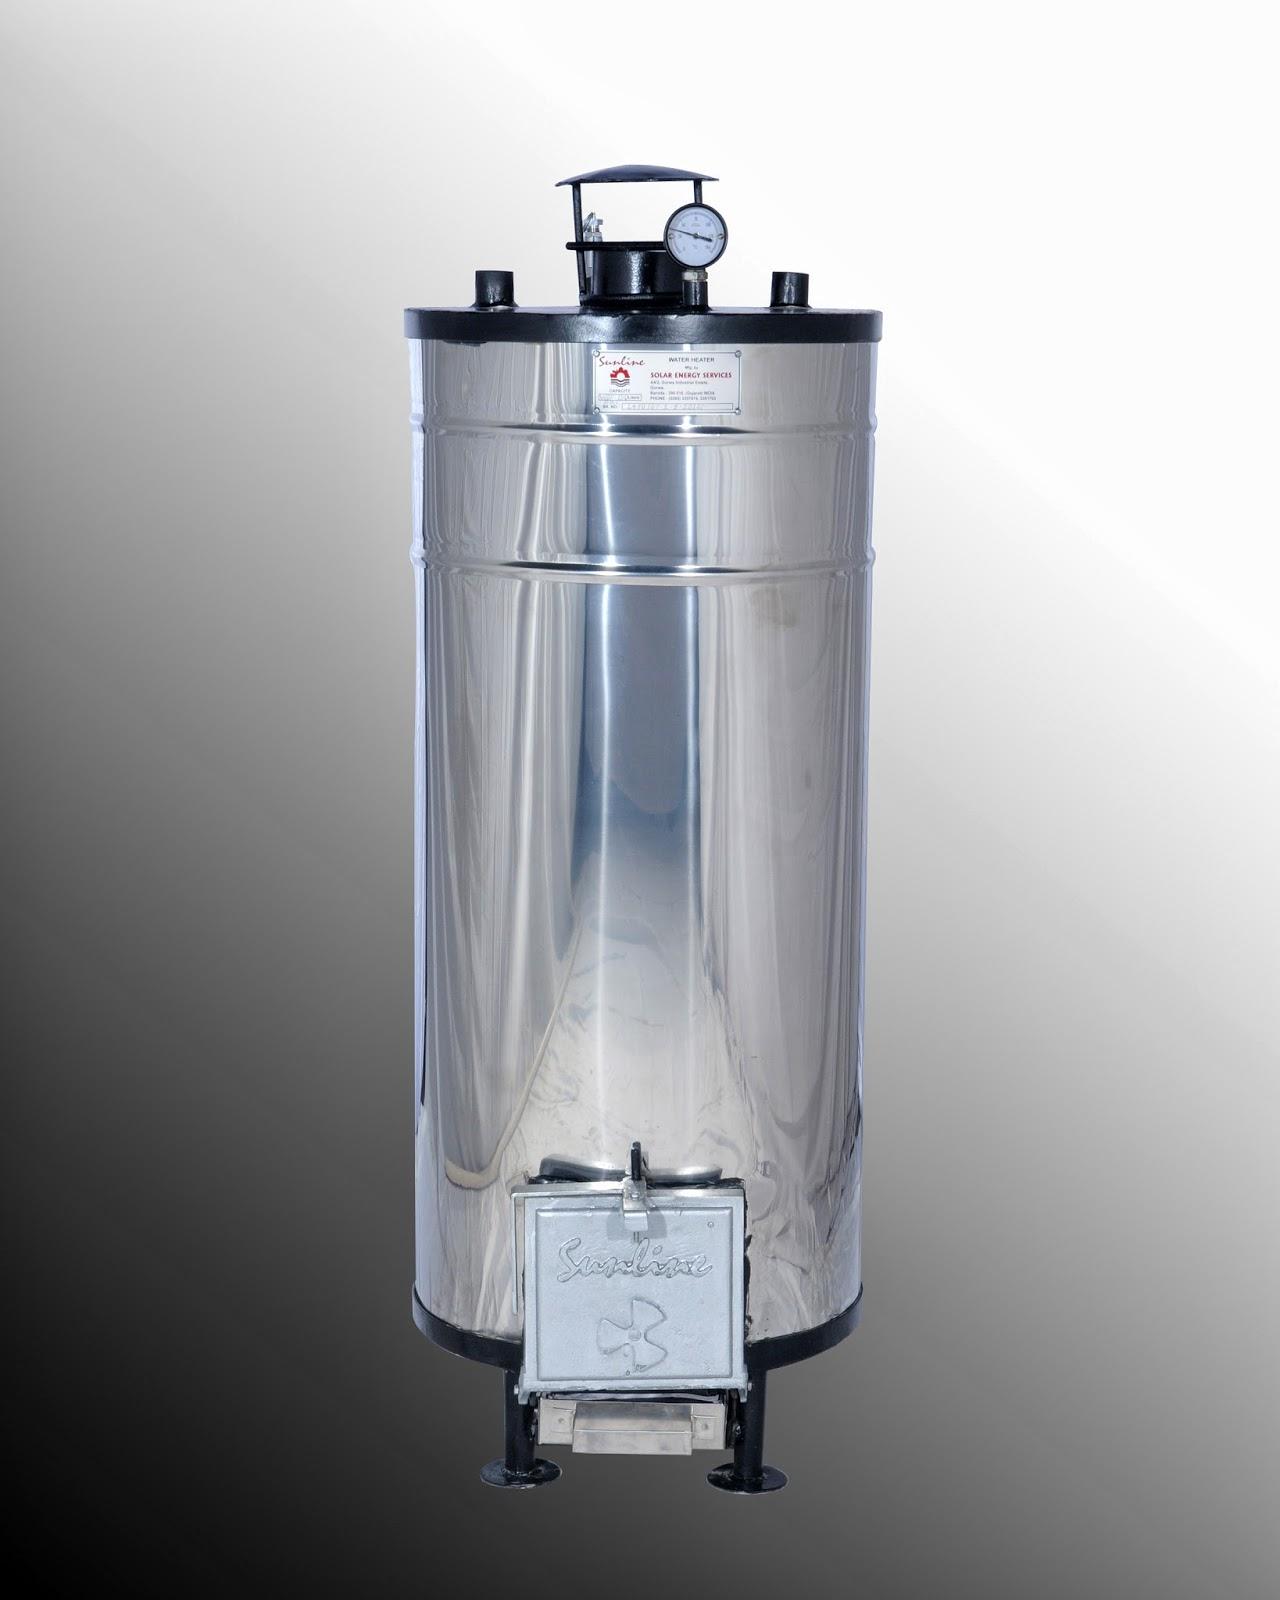 Chauffe eau bois for Chauffe eau piscine